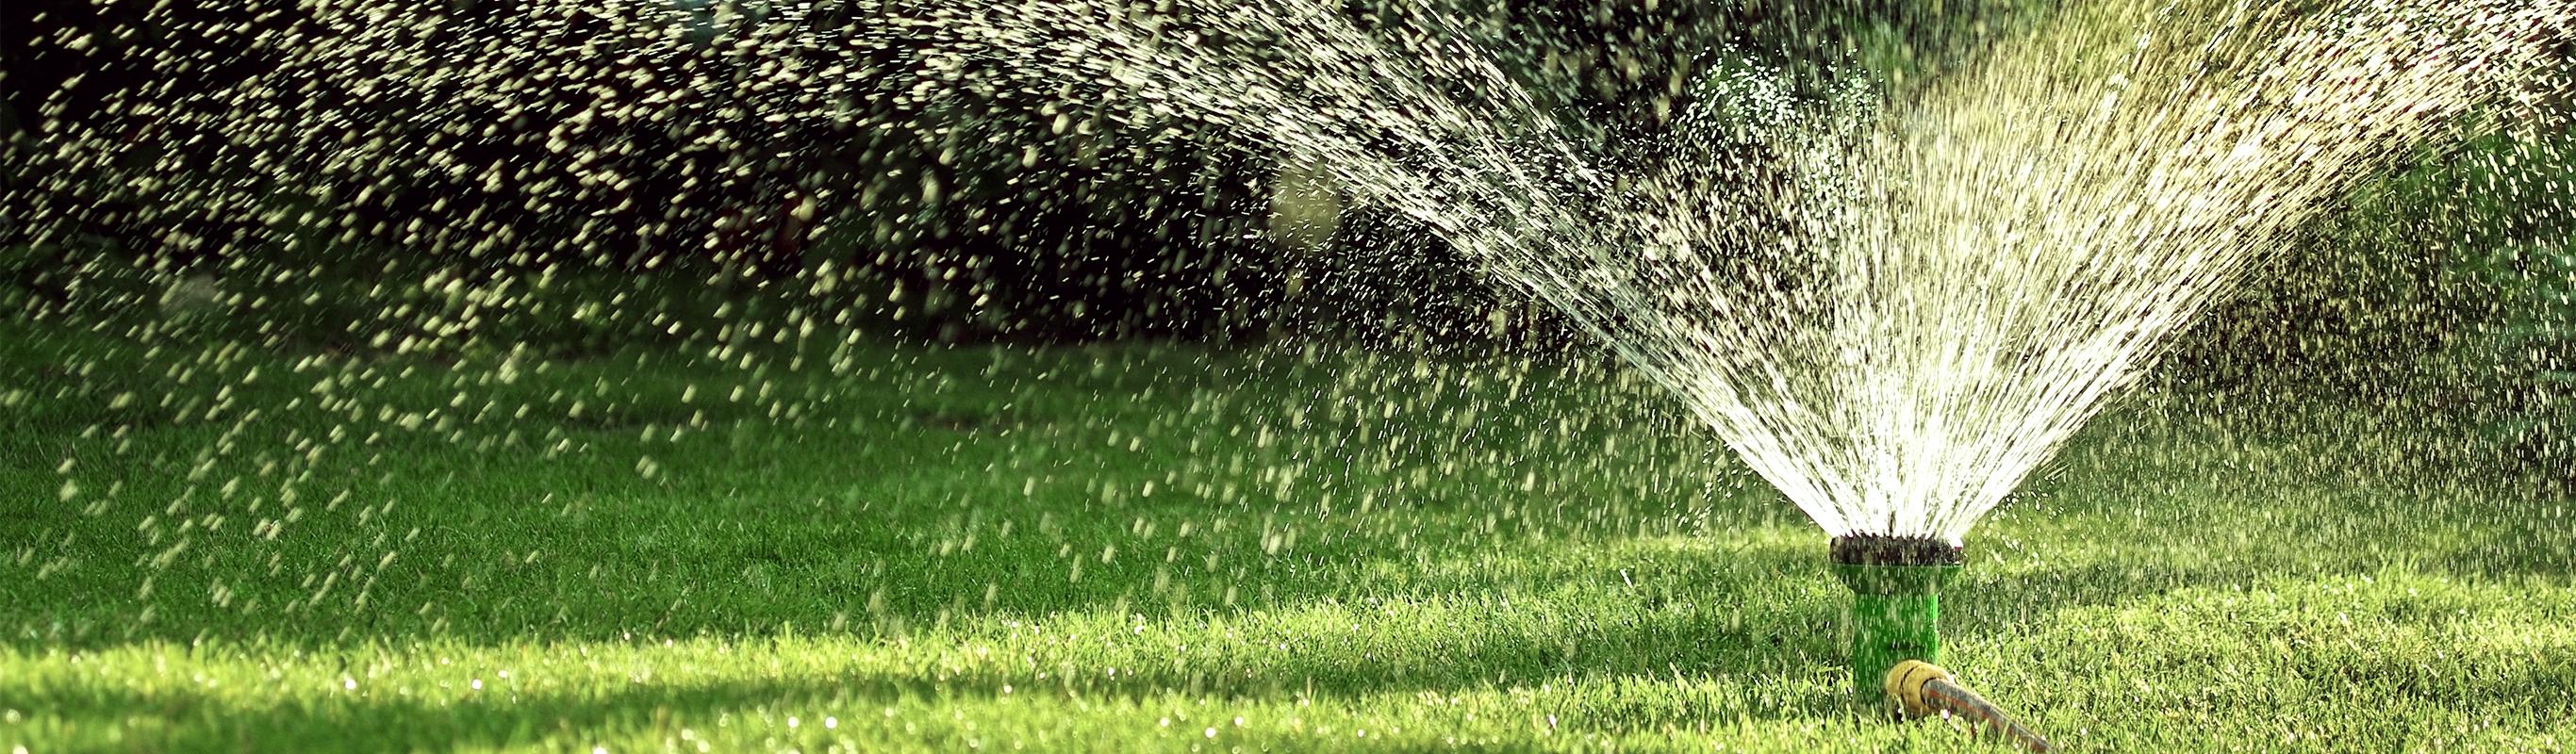 Zisterne Wasser bewaessert den Garten